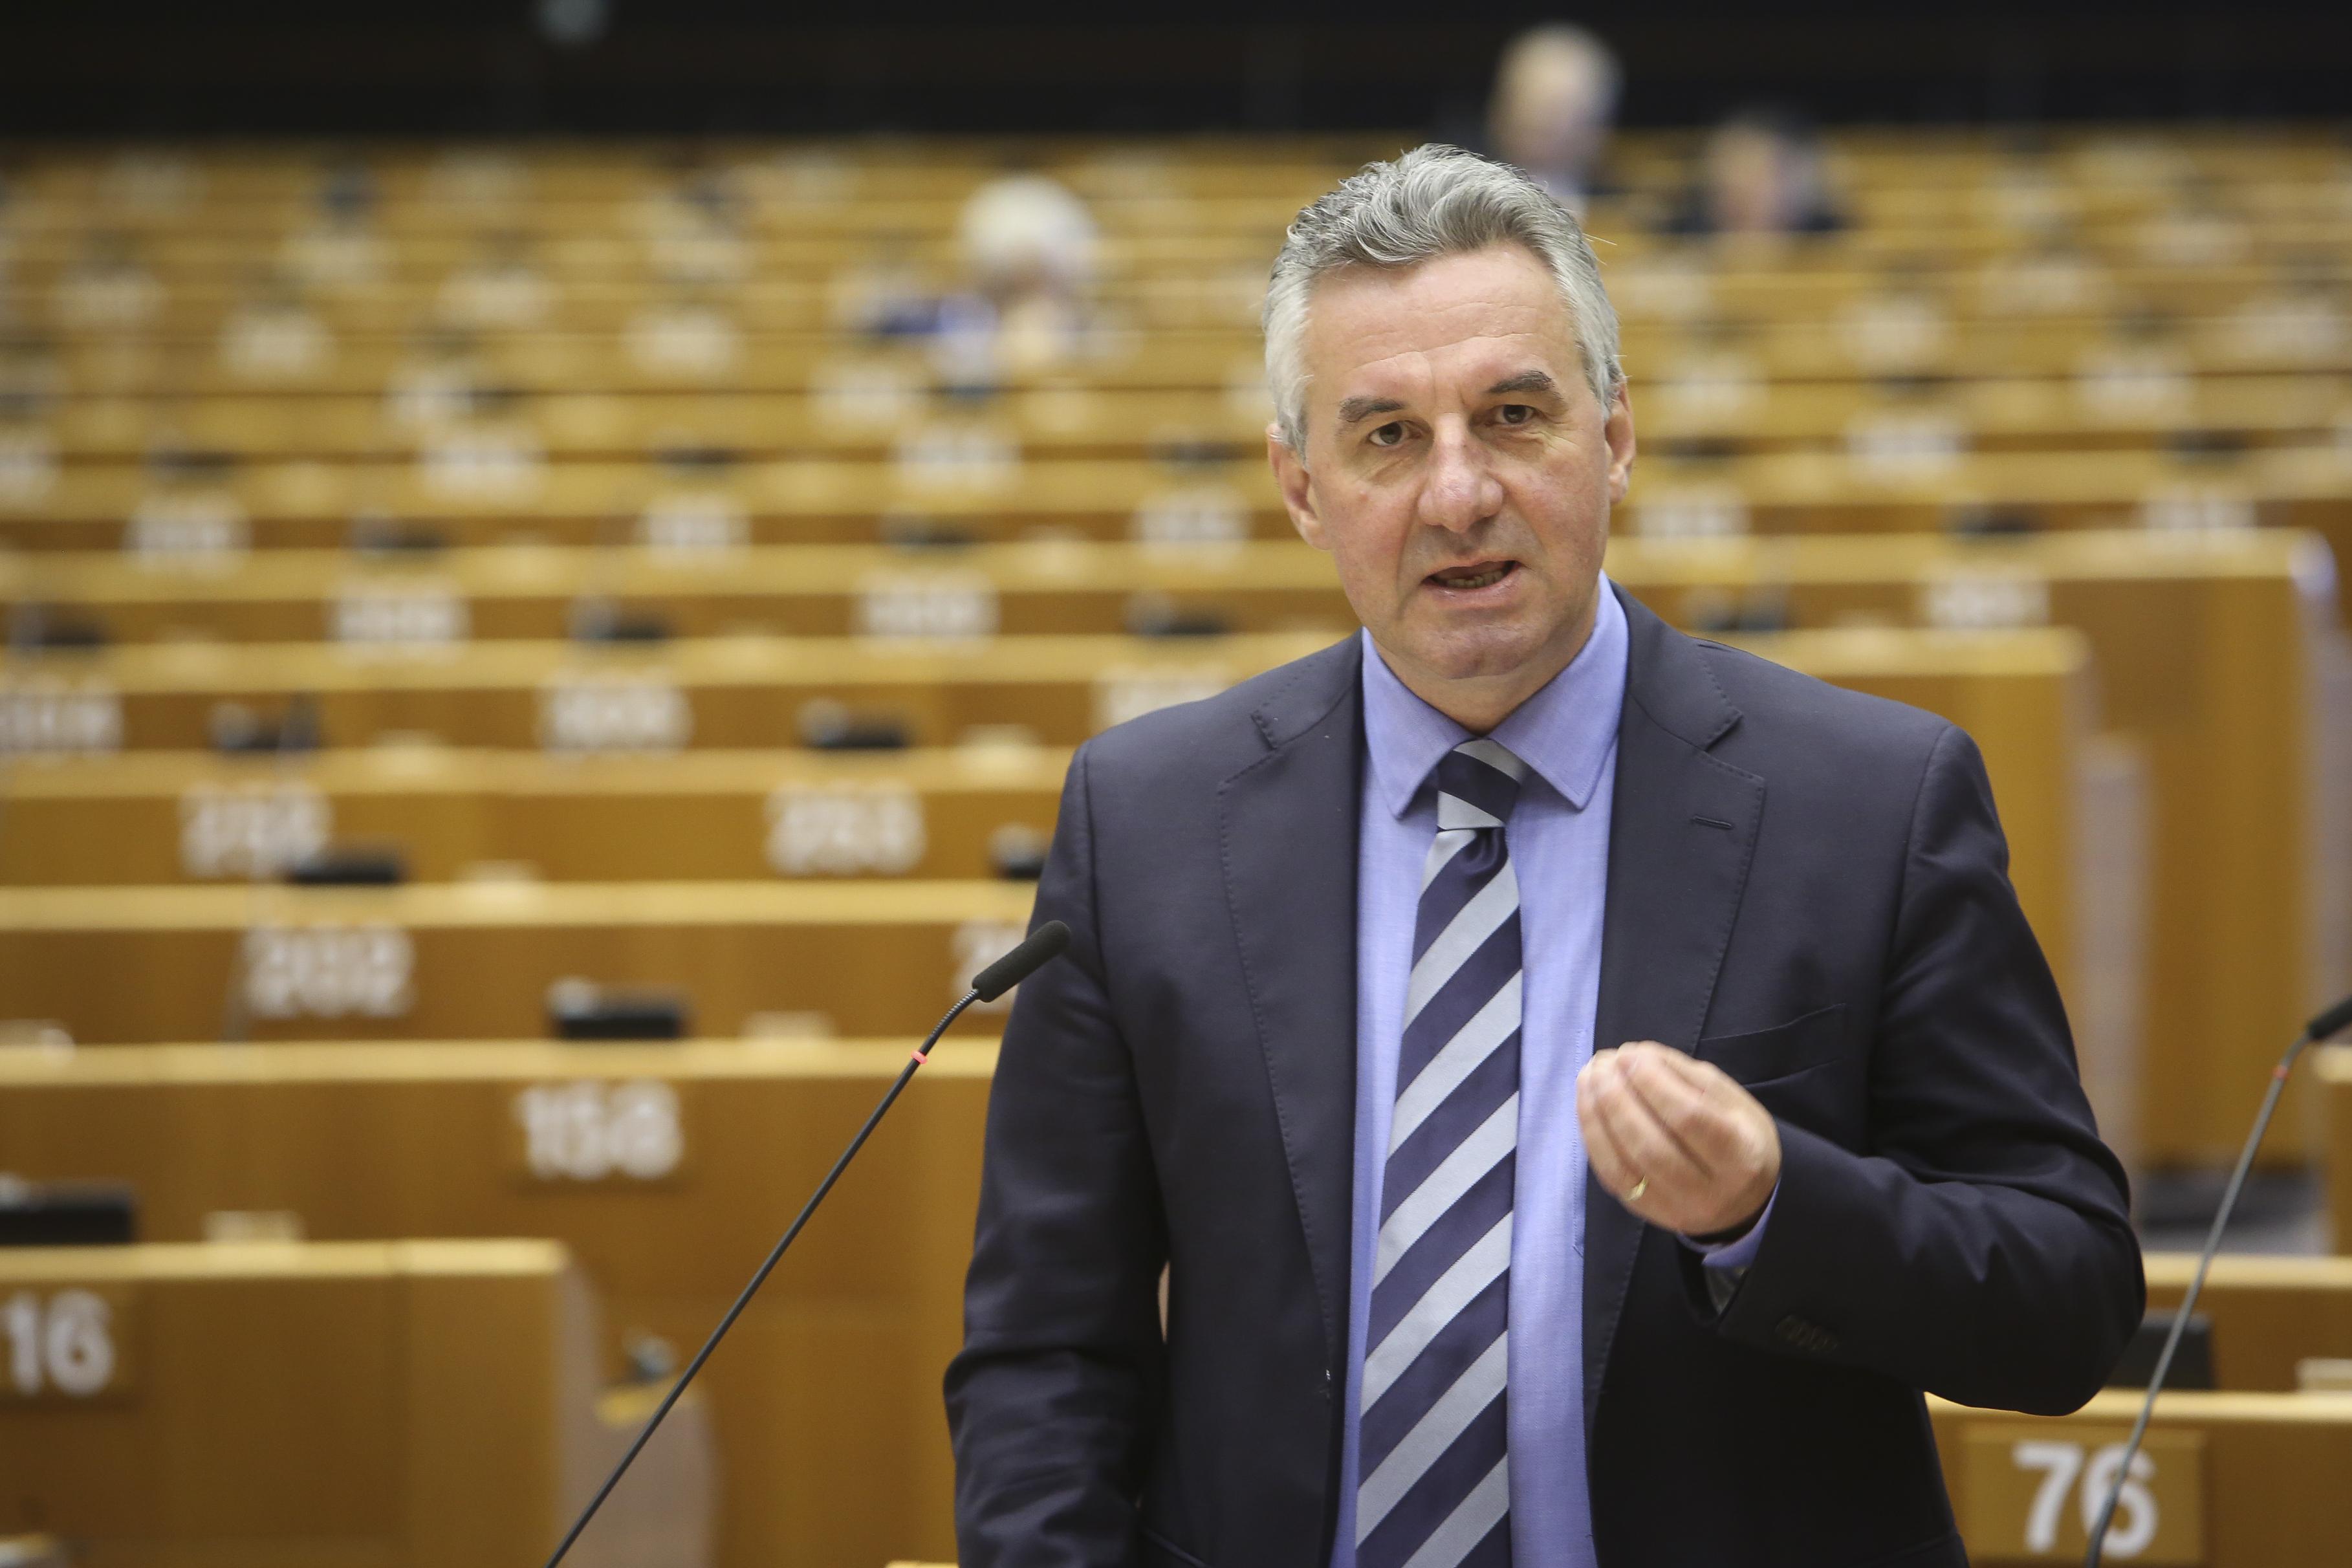 Doors open for the EU-Japan trade ratification